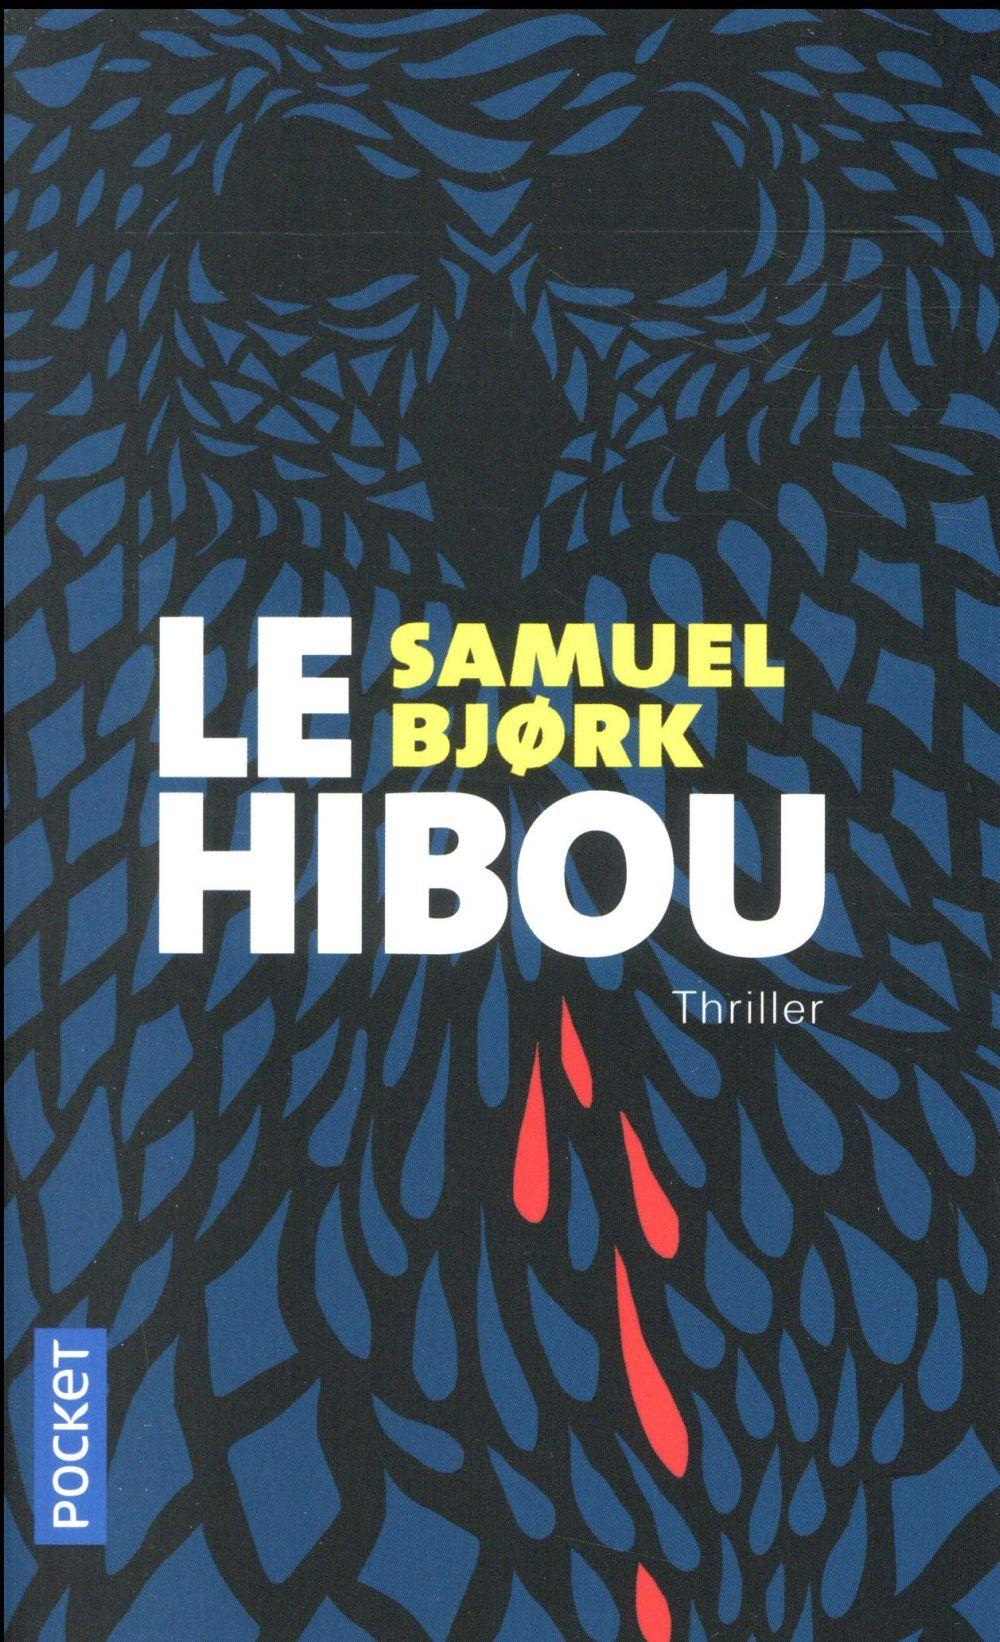 BJORK, SAMUEL - LE HIBOU